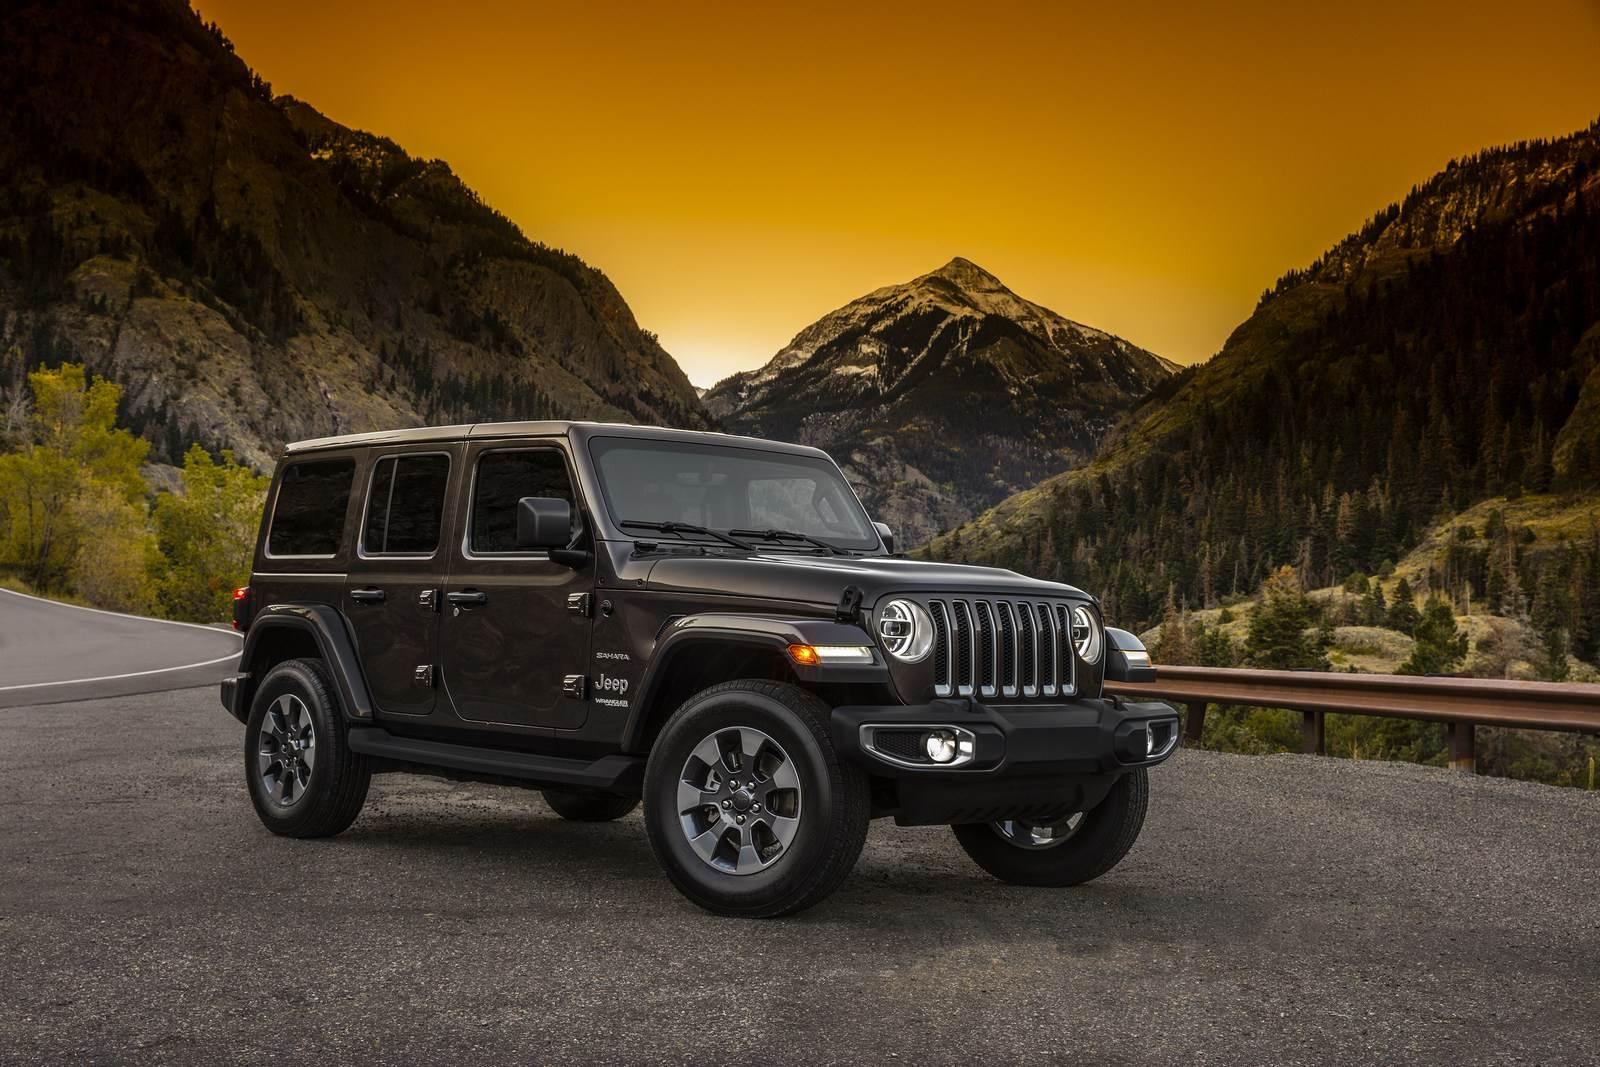 2018 Jeep Wrangler image gallery